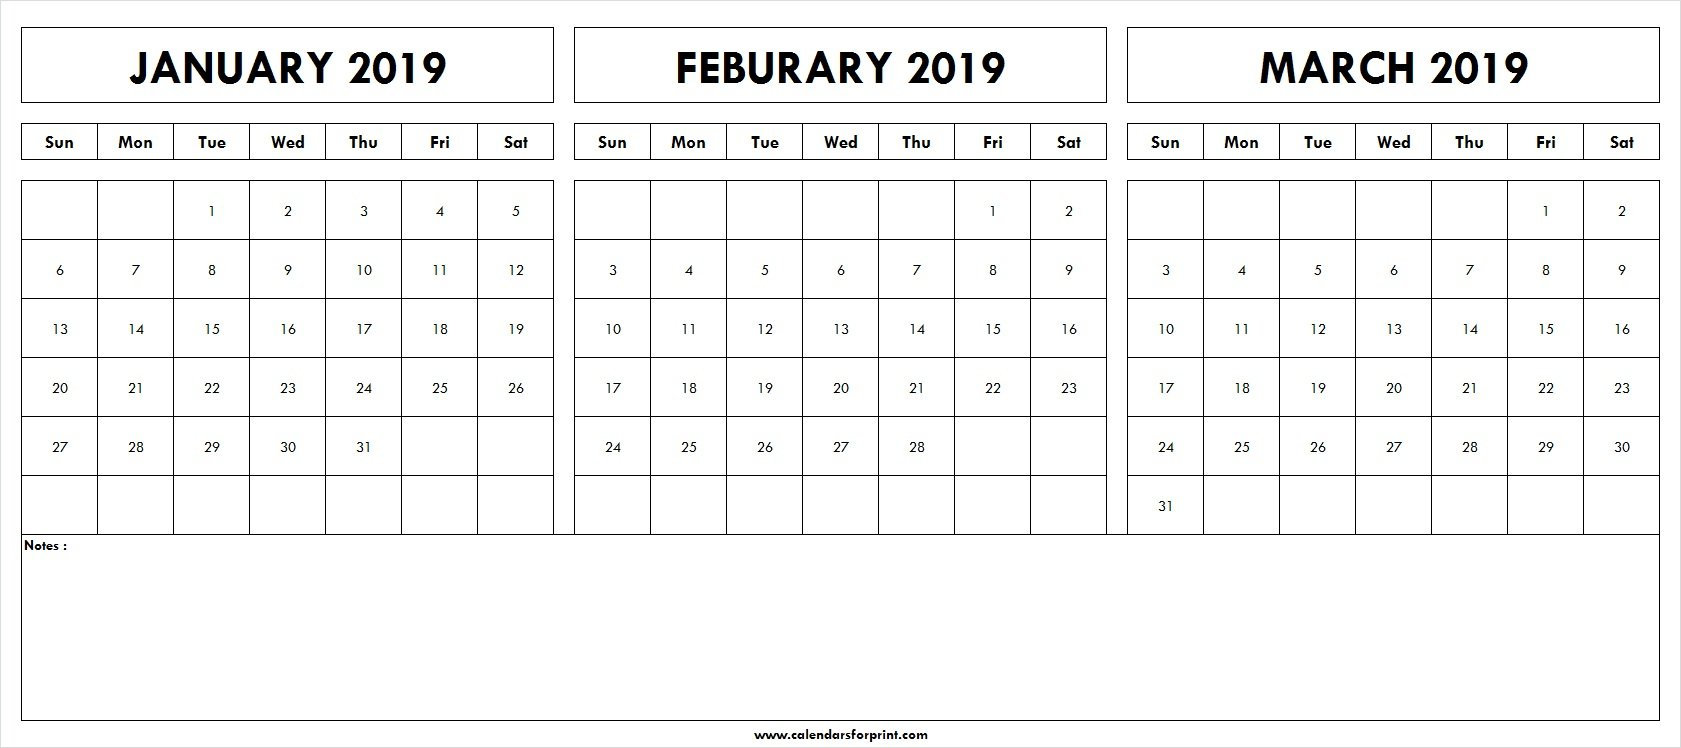 January February March 2019 Calendar Template Printable | Blank Calendar 2019 January February March